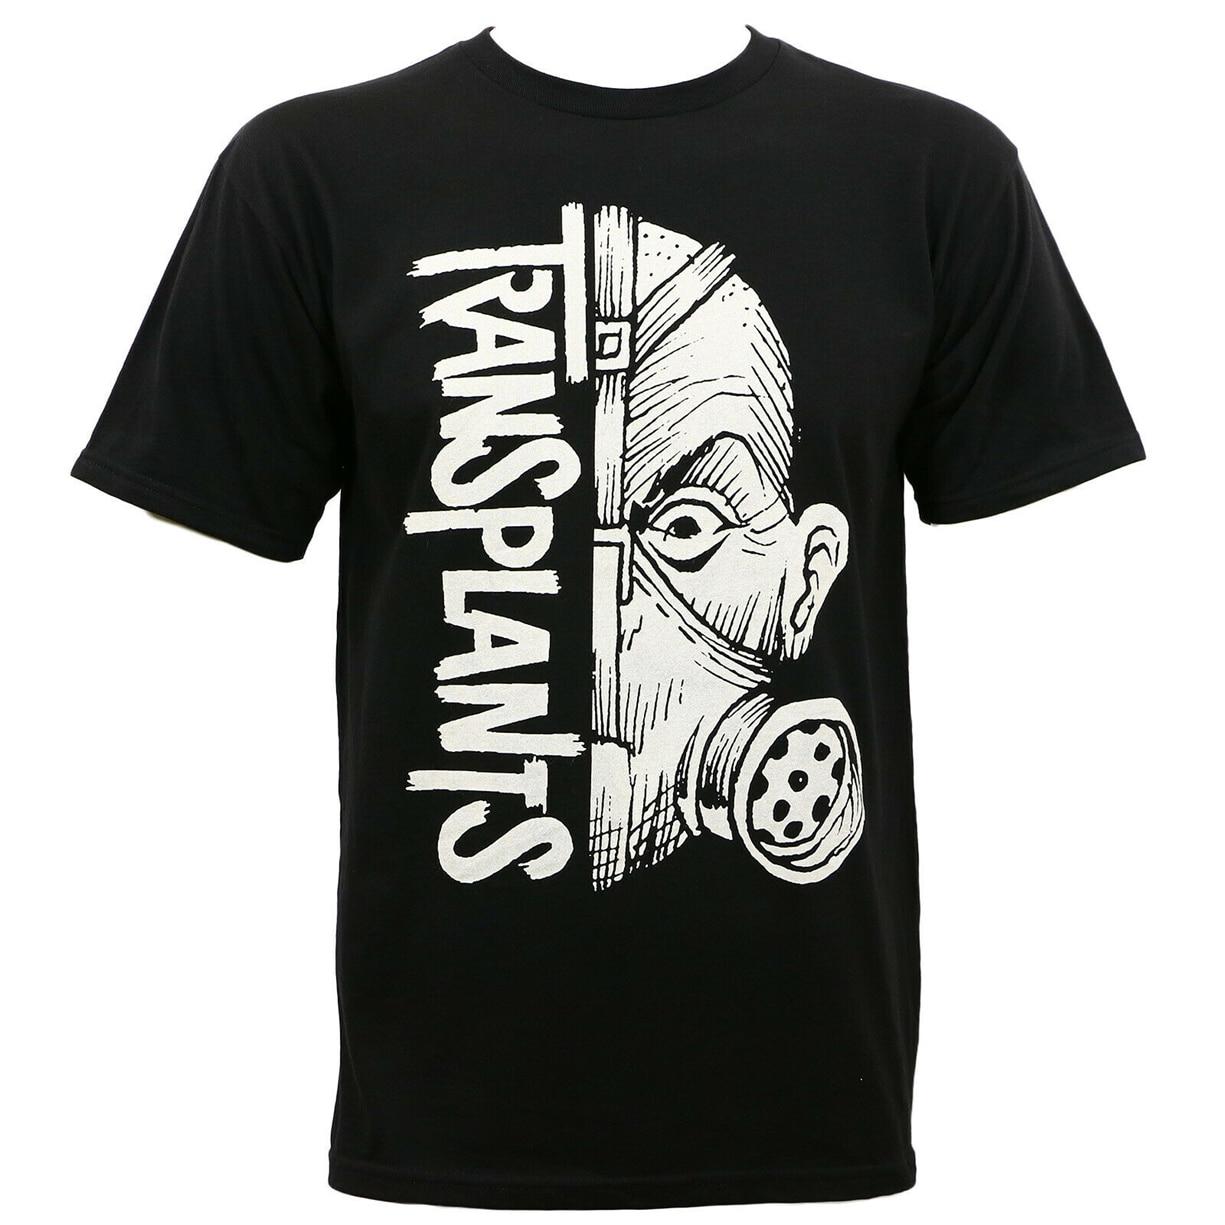 Authentic TRANSPLANTS Band Half Mask T-Shirt Black S M L XL 2XL NEW Tee Shirt Streetwear Fashion Casual Plus-Size